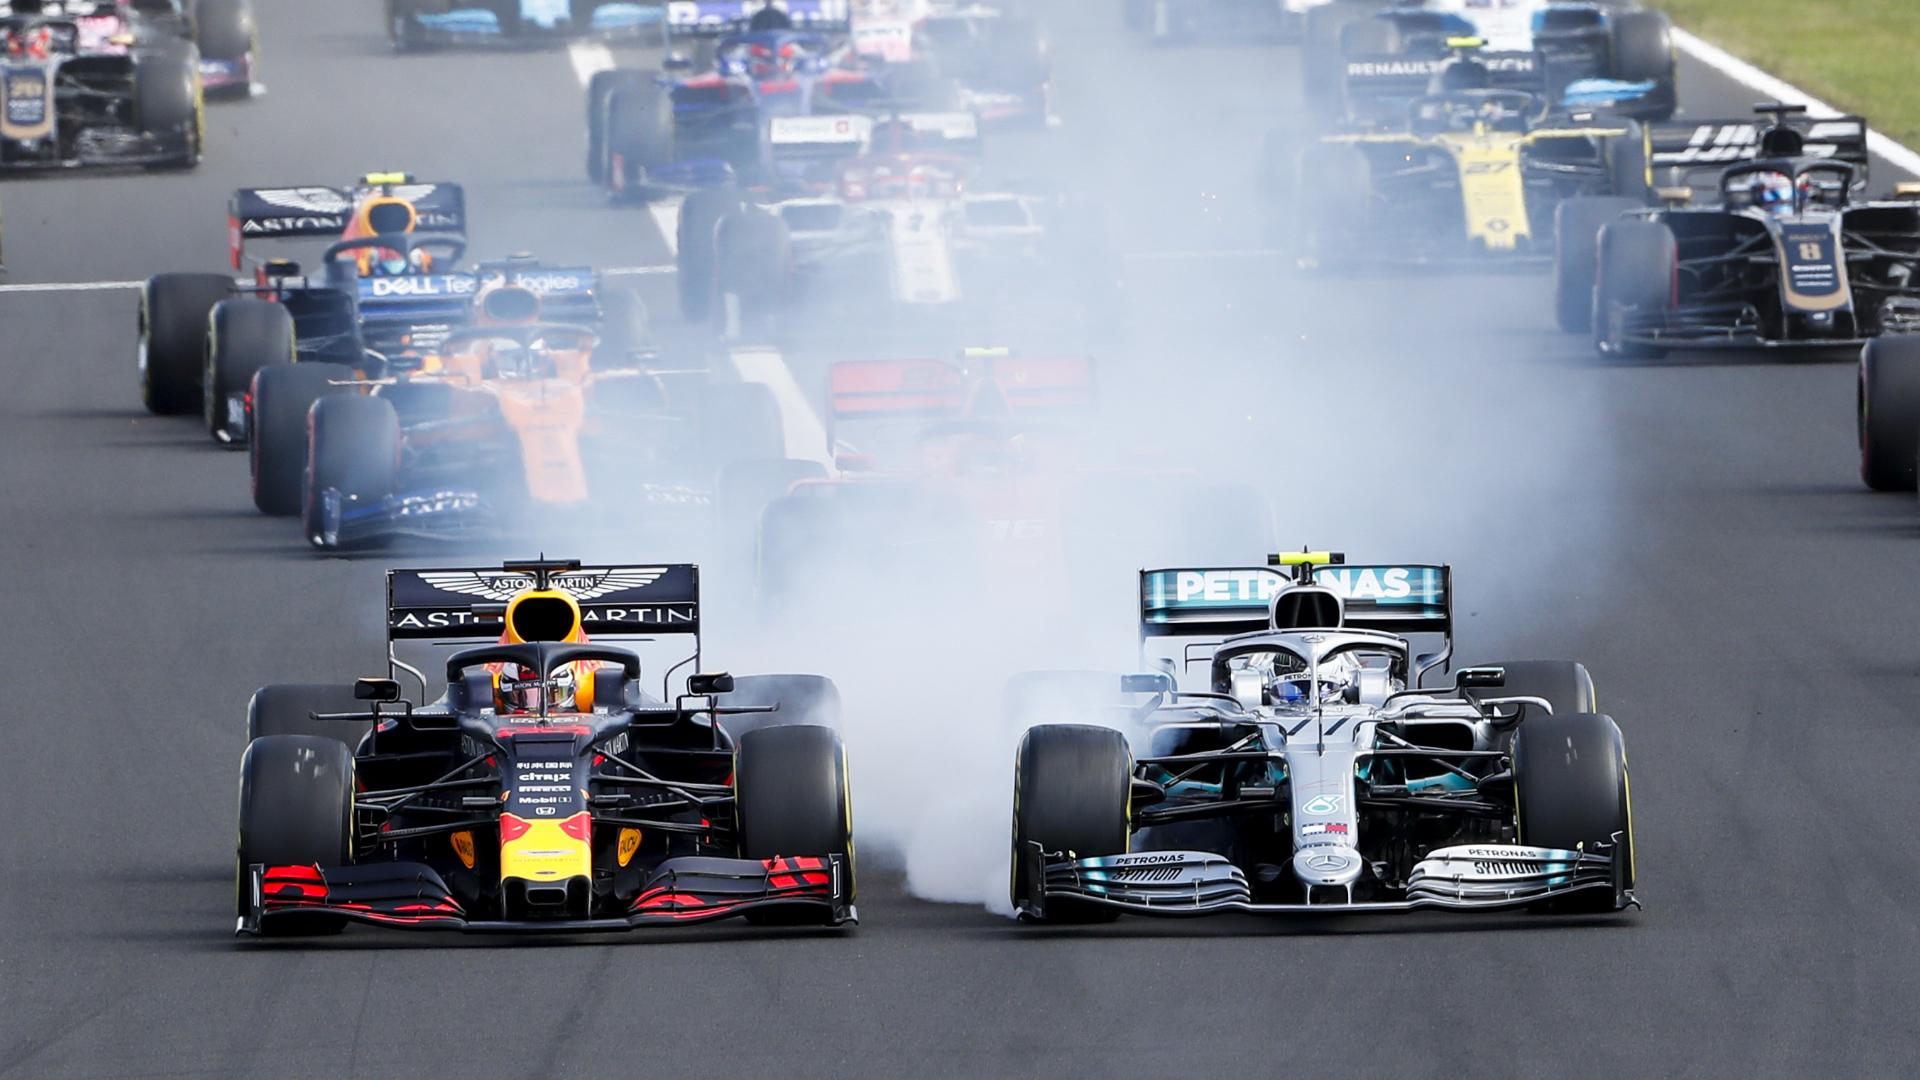 Hungarian Grand Prix 2019 F1 race report: Hamilton brilliantly hunts